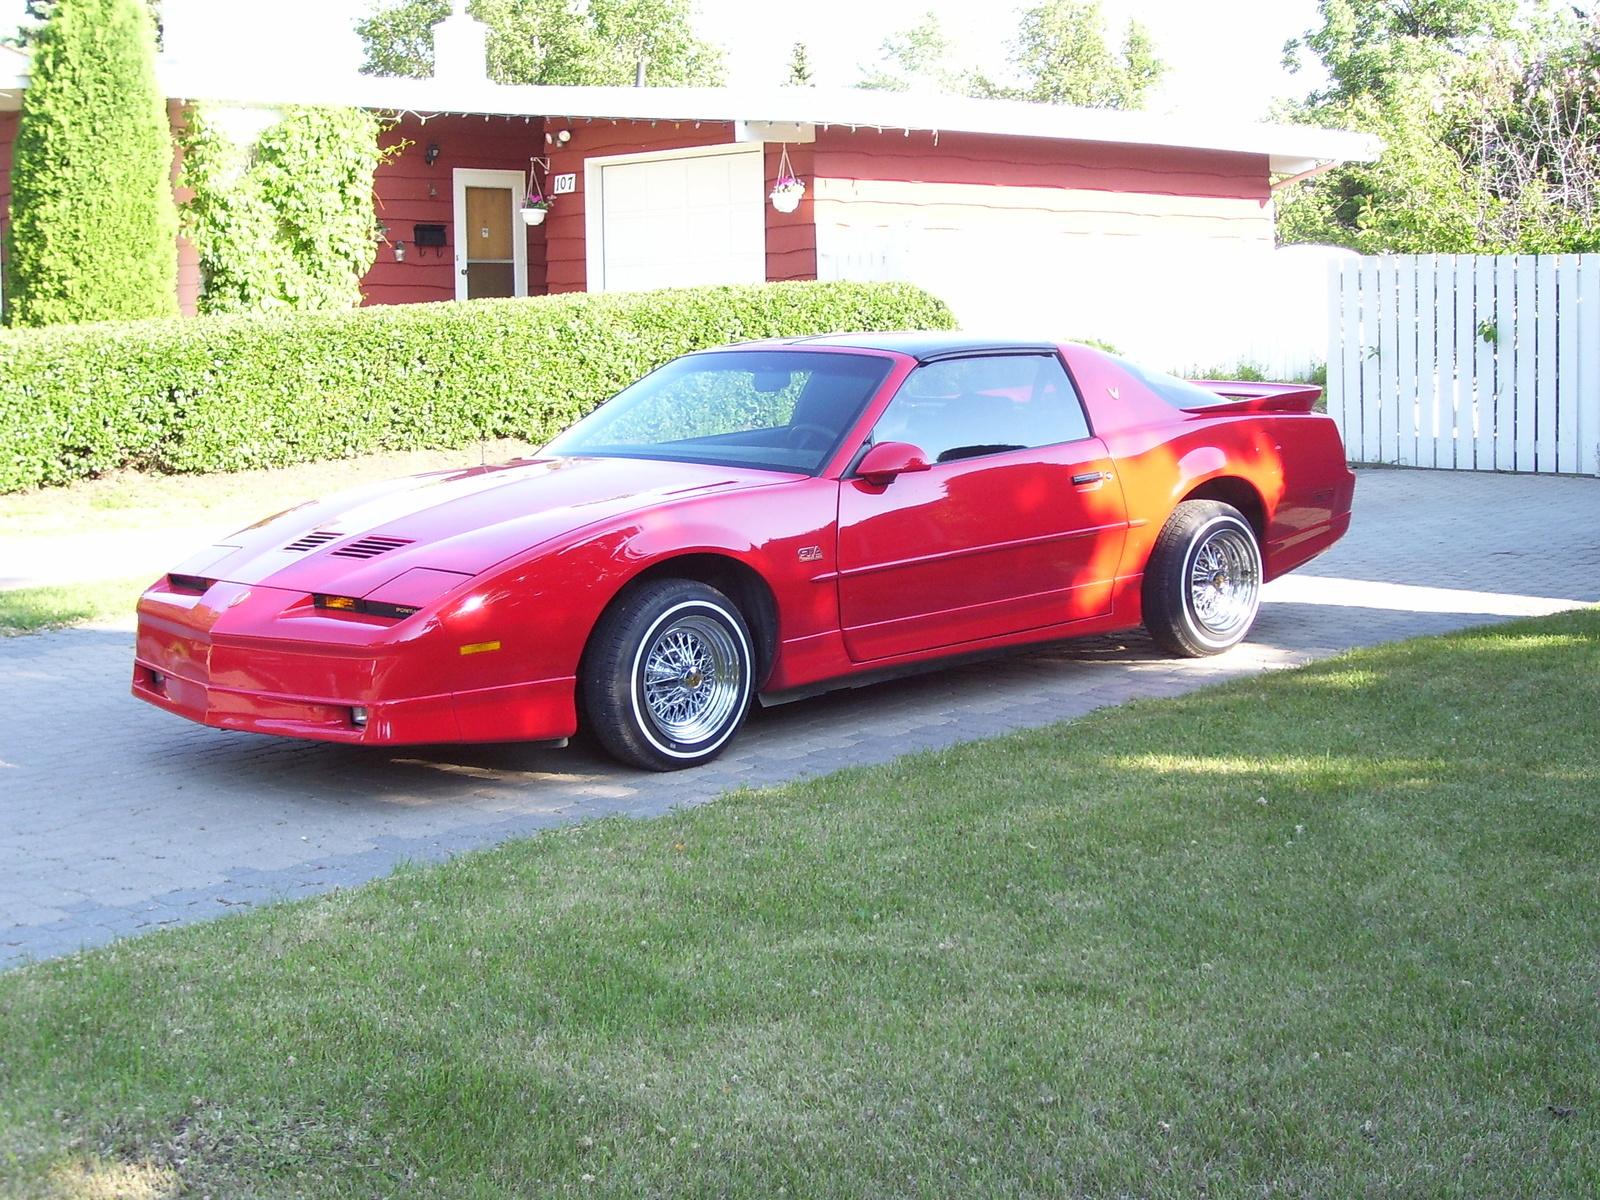 3dtuning Of Pontiac Firebird Trans Am Gta Coupe 1987 3dtuning Com Unique On Line Car